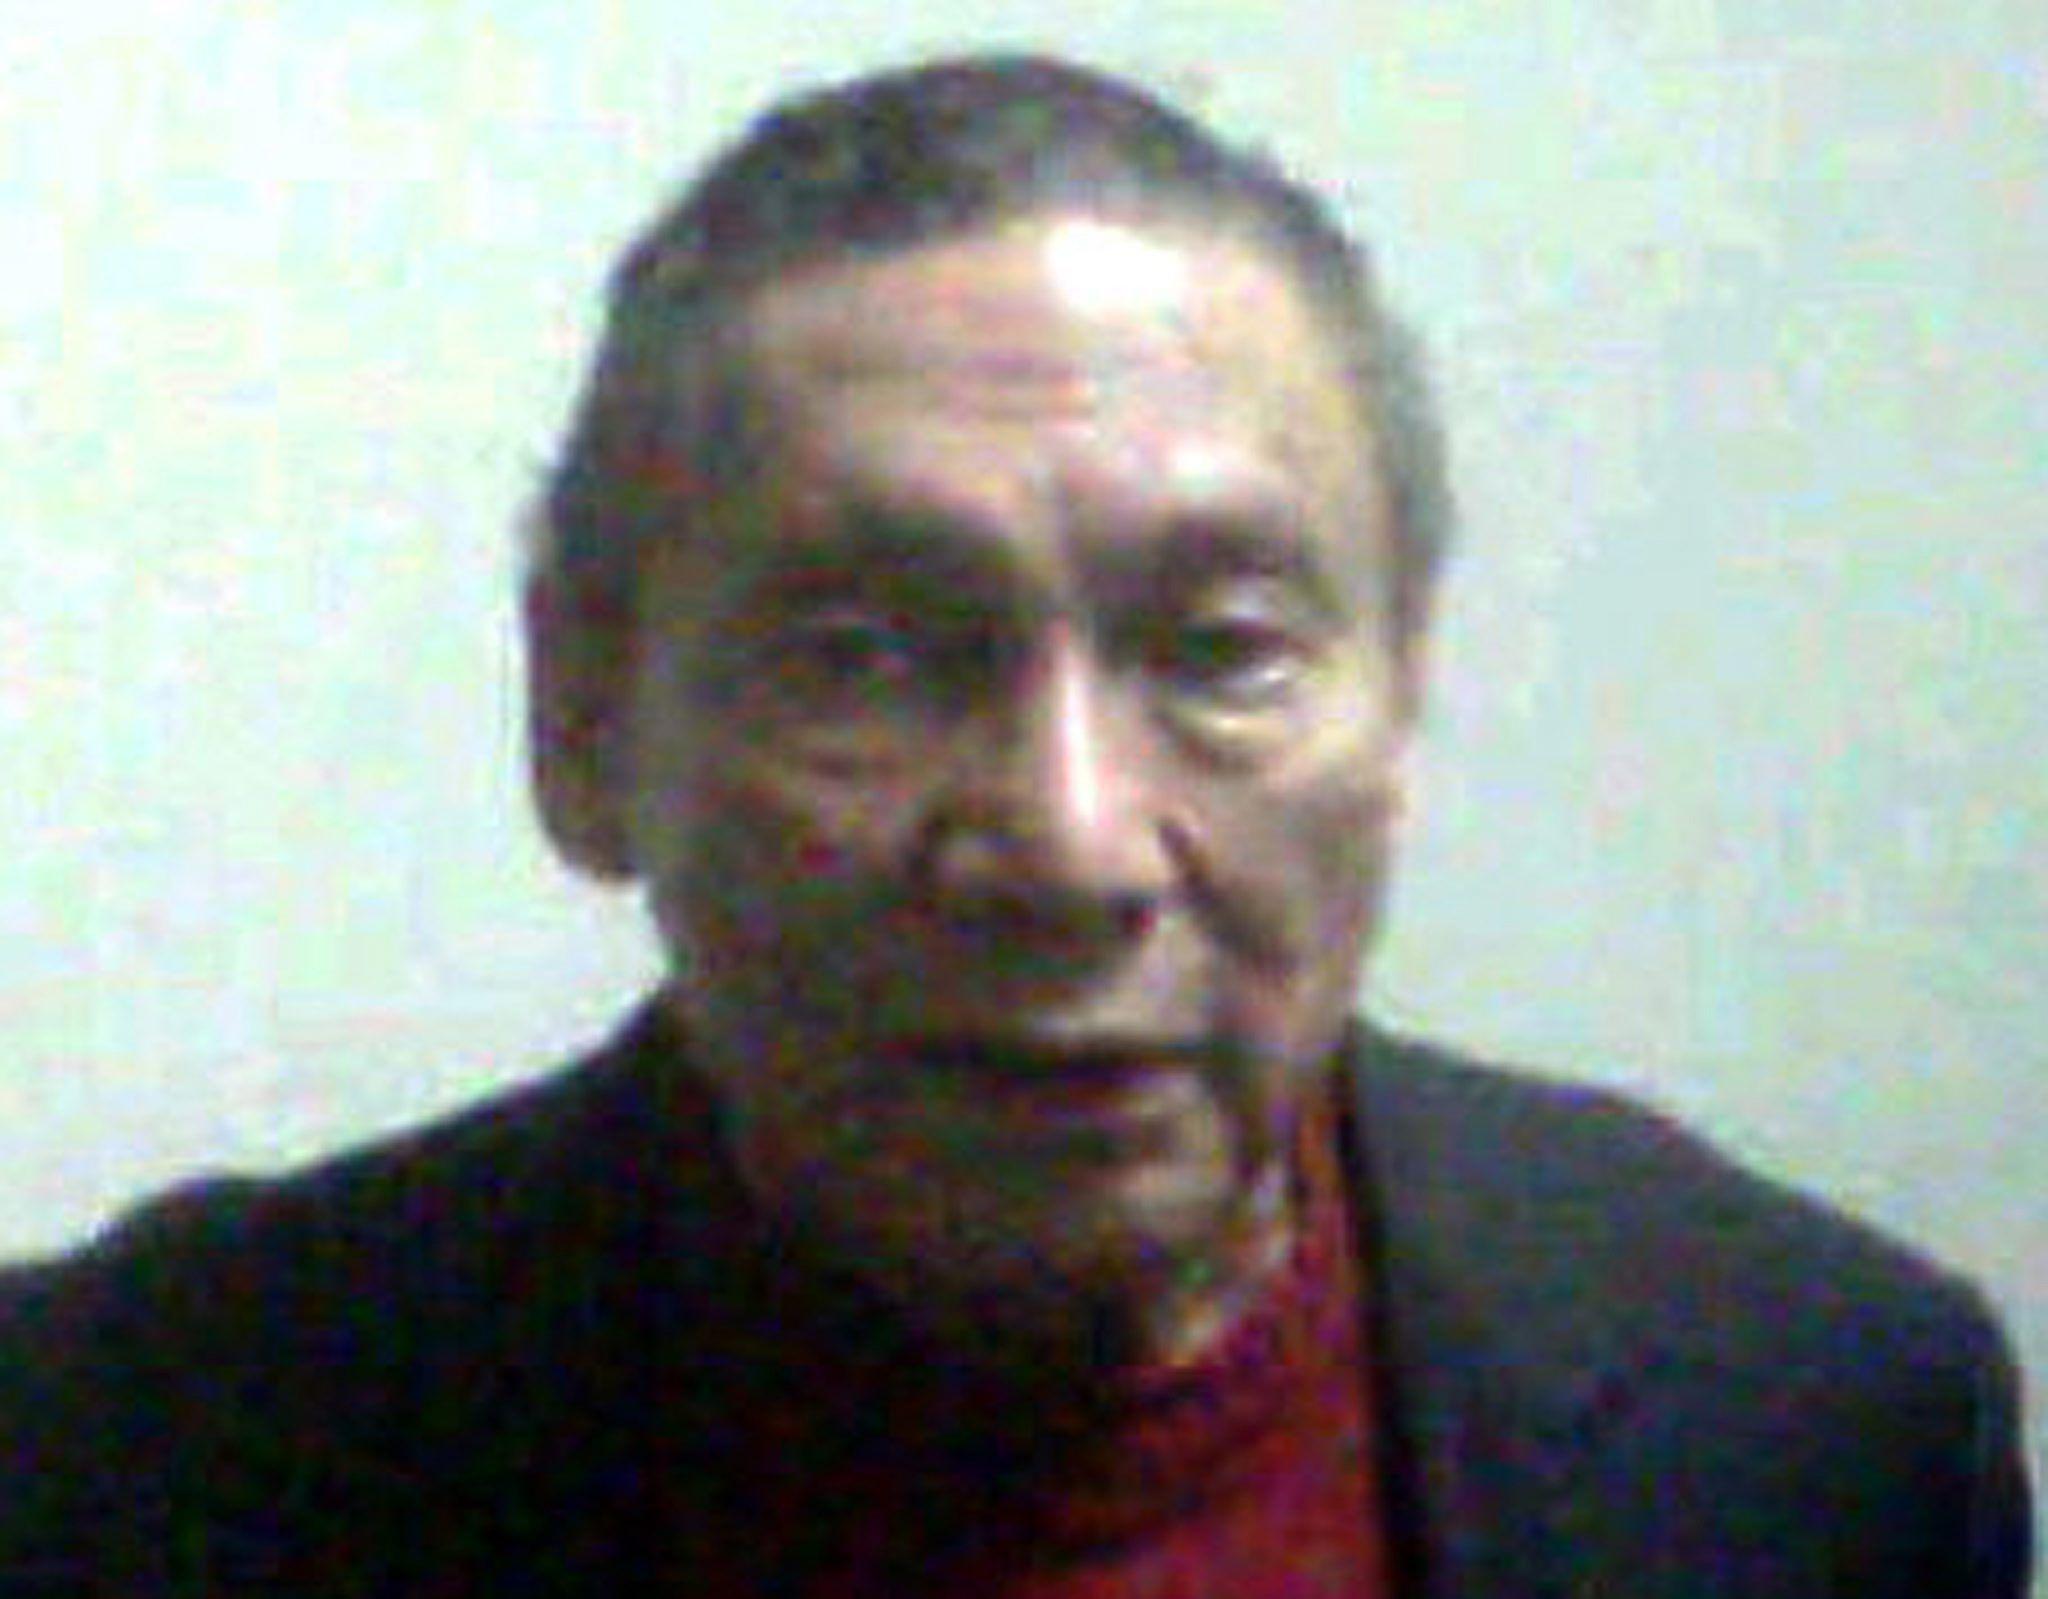 EXTRADITION OF FORMER DICTATOR MANUEL ANTONIO NORIEGA TO PANAMA